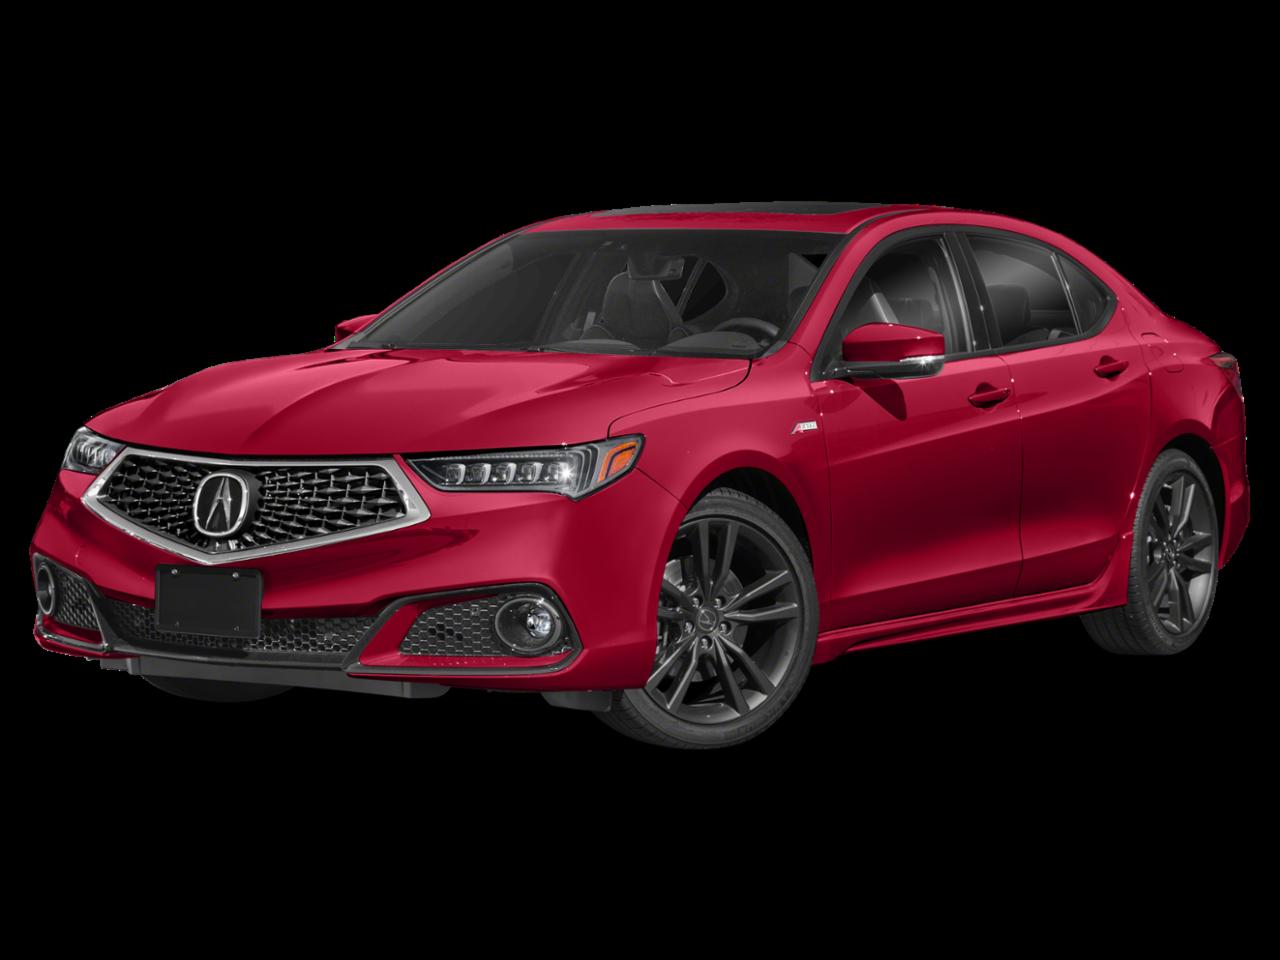 Acura 2020 TLX w/A-Spec Pkg